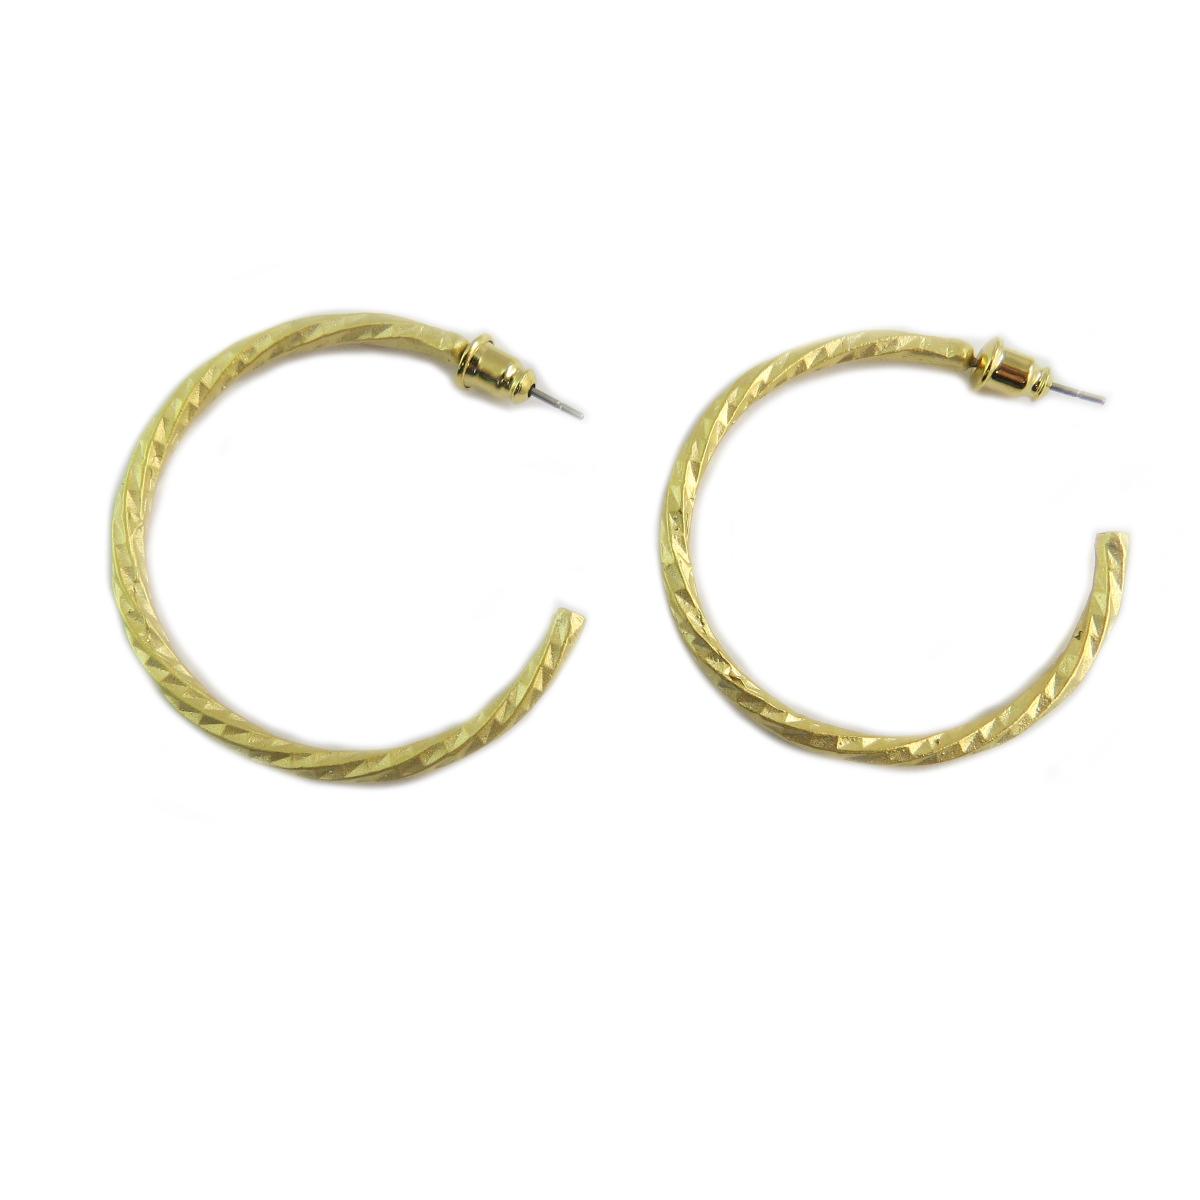 Boucles artisanales \'Cléopatra\' doré  - 40 mm 3 mm - [Q5642]